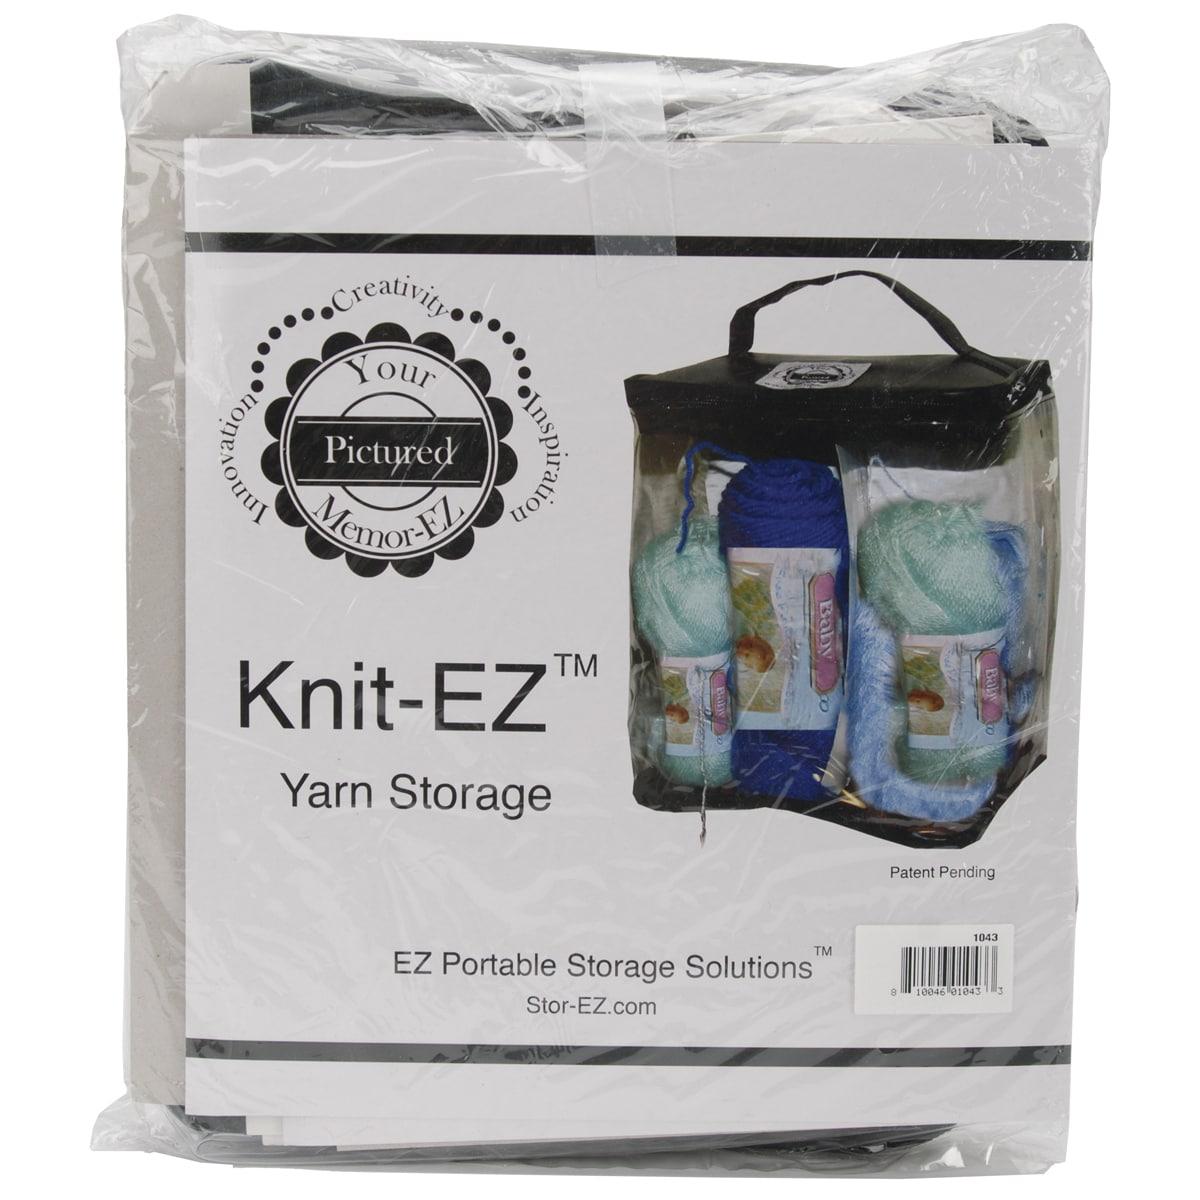 Knit-EZ